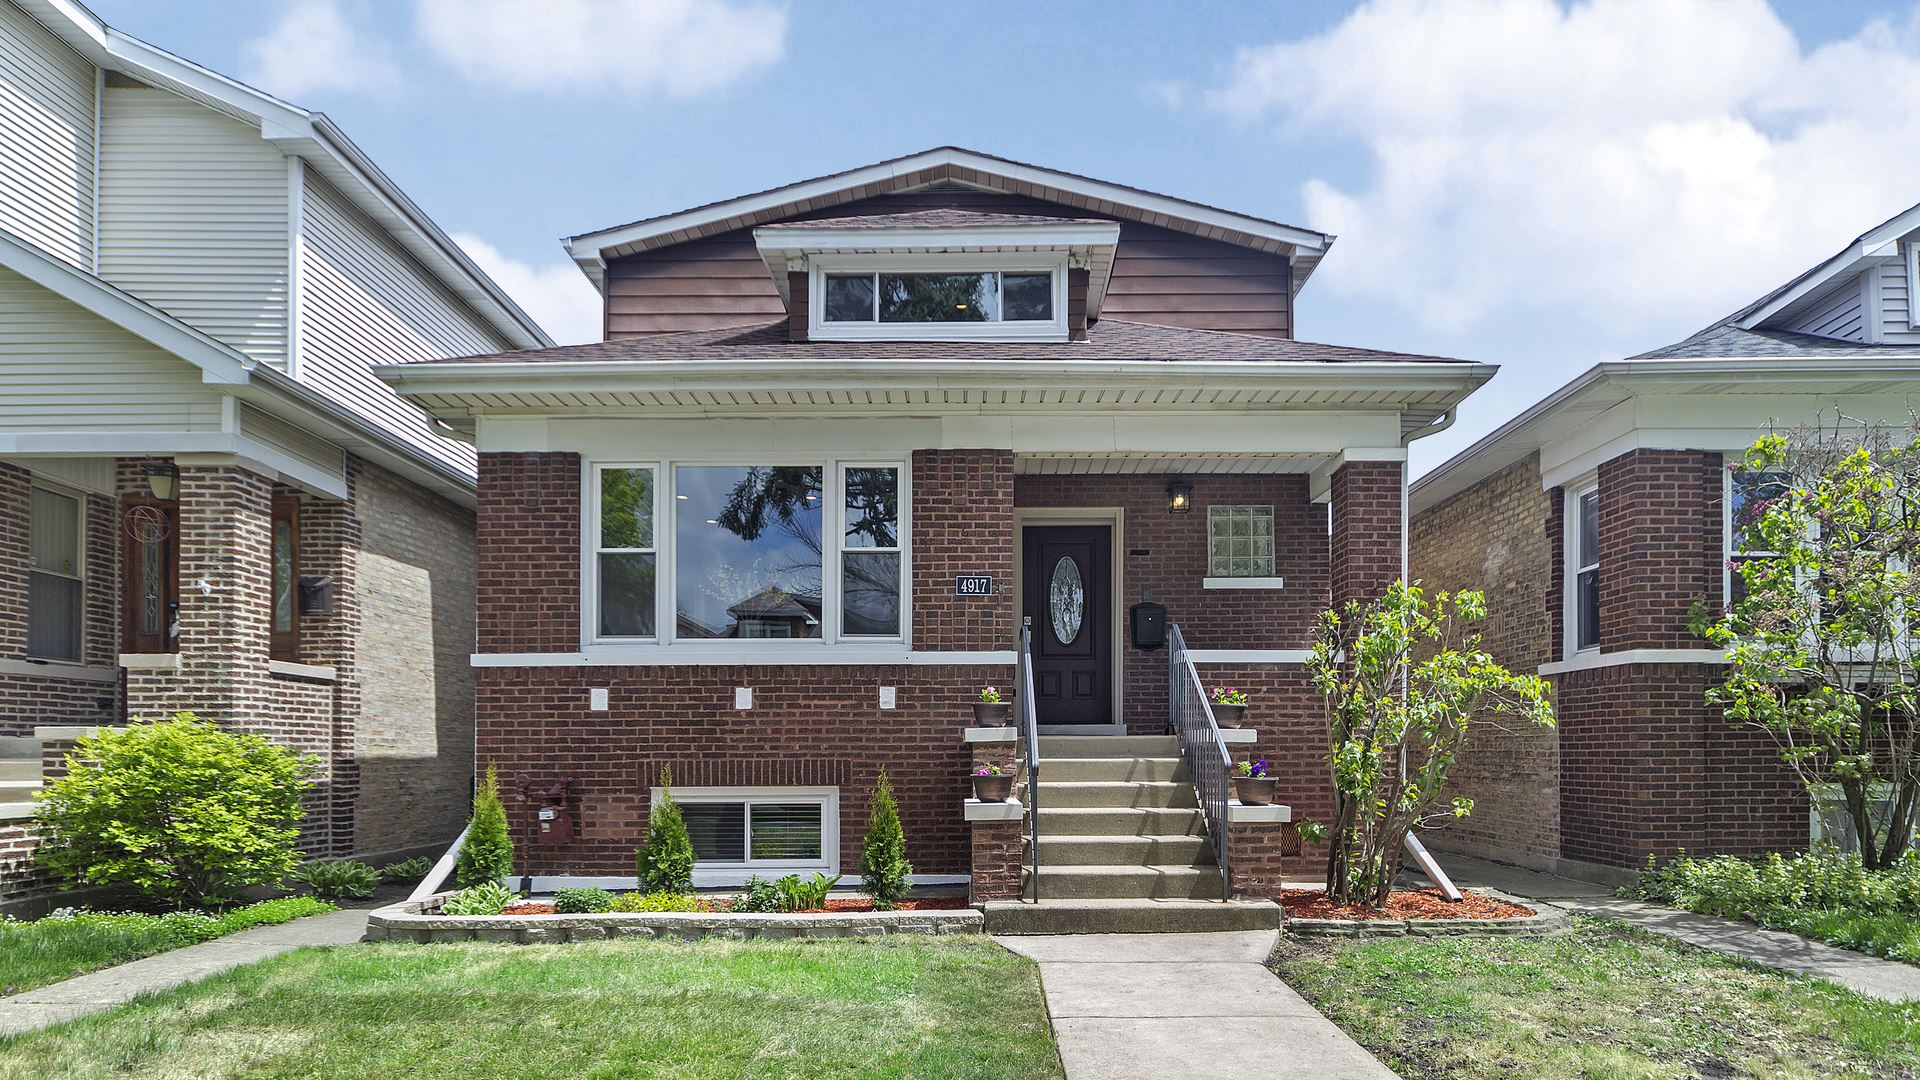 4917 N Keeler Avenue, Chicago, IL 60630 - #: 10733770